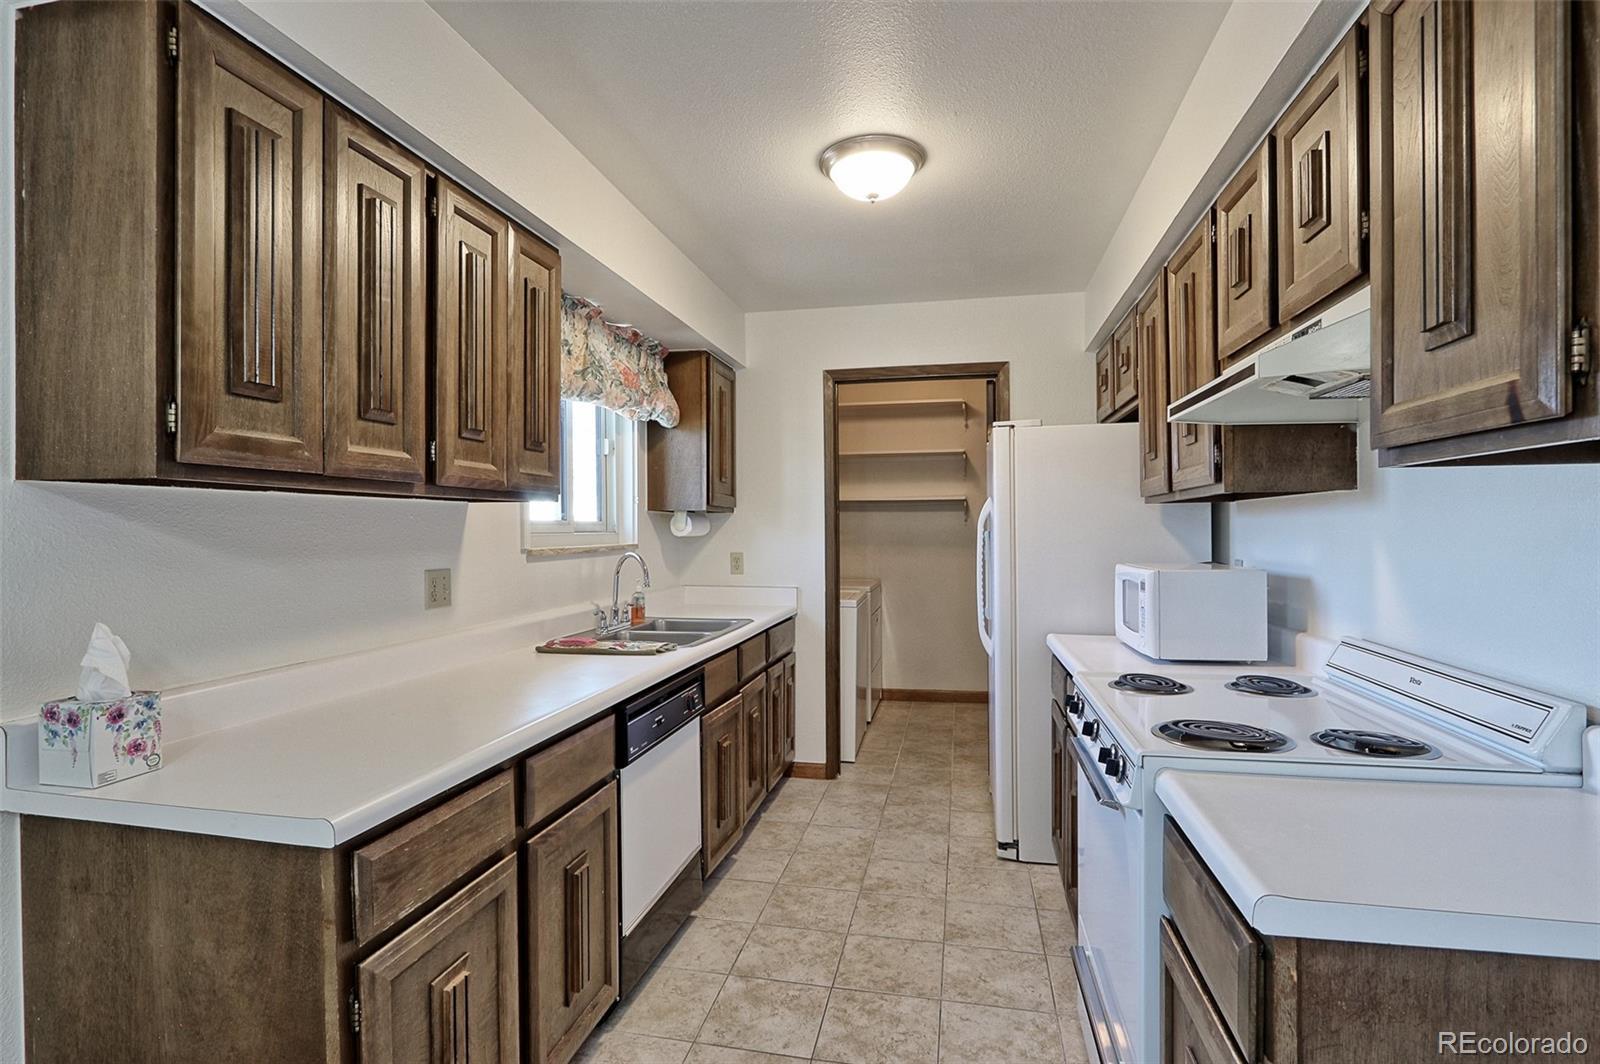 MLS# 1524000 - 5 - 9758 Orangewood Drive, Thornton, CO 80260